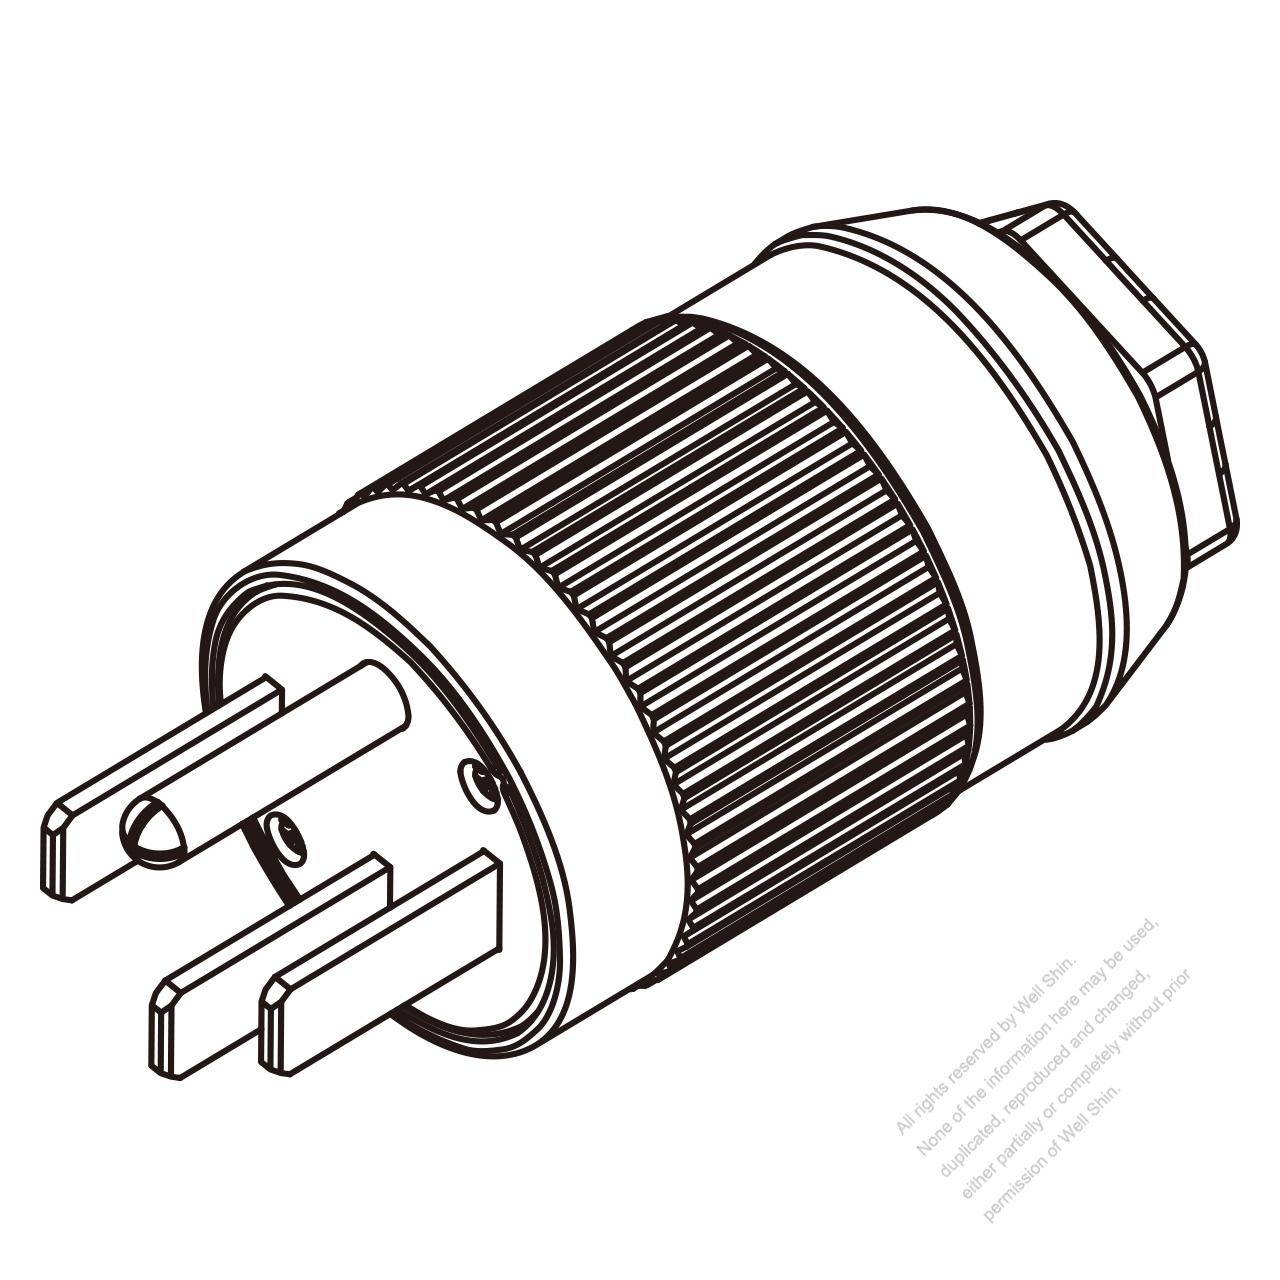 hight resolution of usa canada rv plug nema 14 50p 4 pin straight